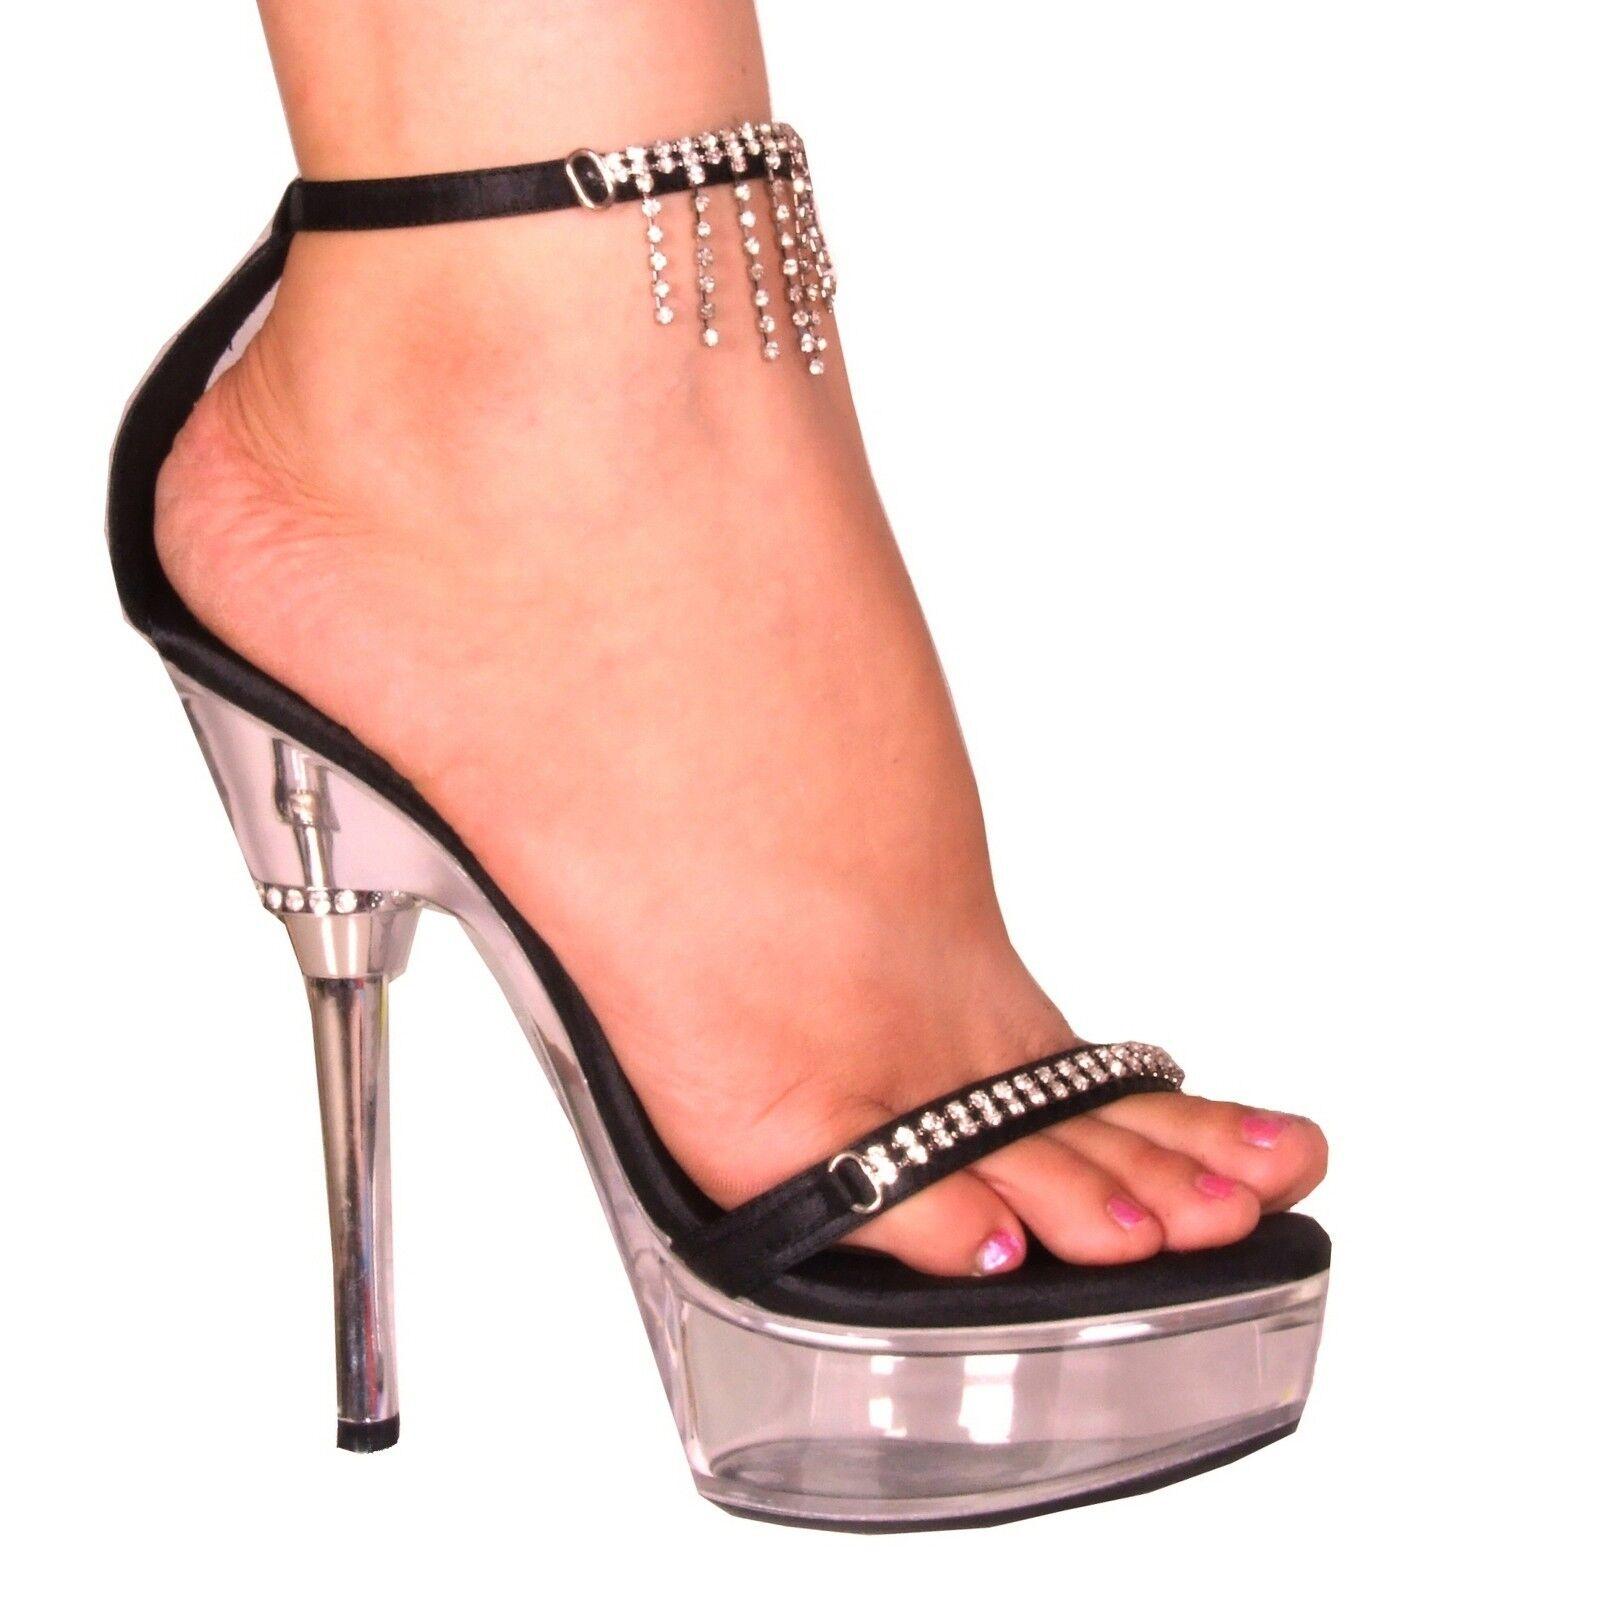 Desire Black Satin 5.5 inch Stiletto Heel Diamante Dancer Platform Sandal UK 5